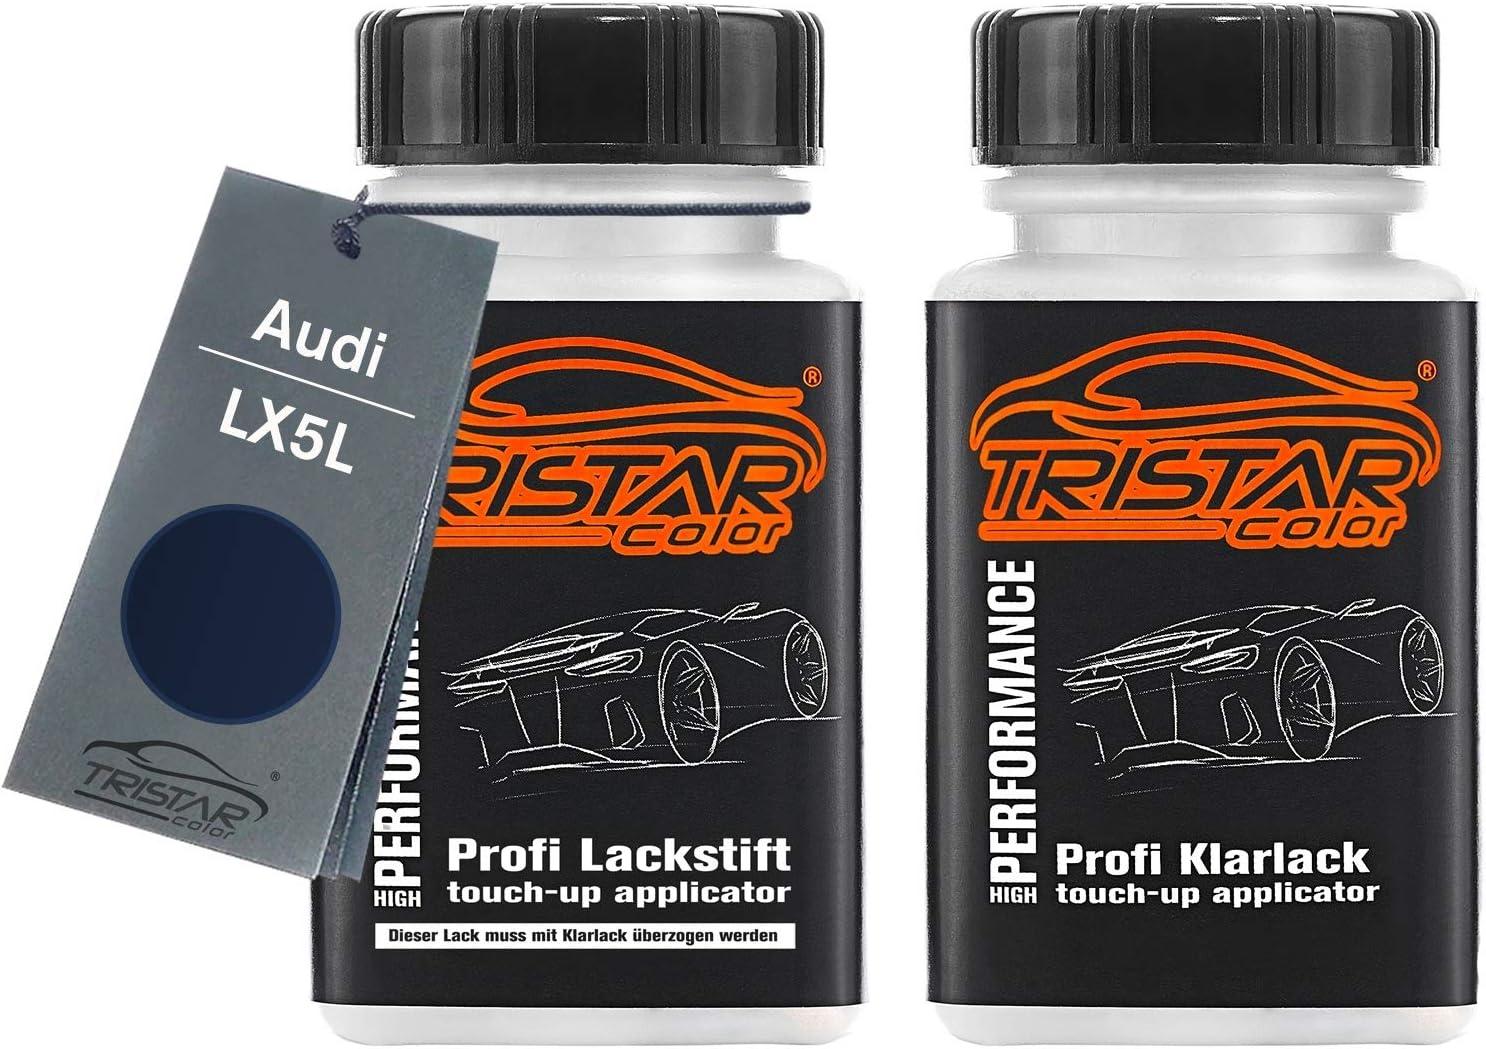 Tristarcolor Autolack Lackstift Set Für Audi Lx5l Utopiablau Metallic Basislack Klarlack Je 50ml Auto